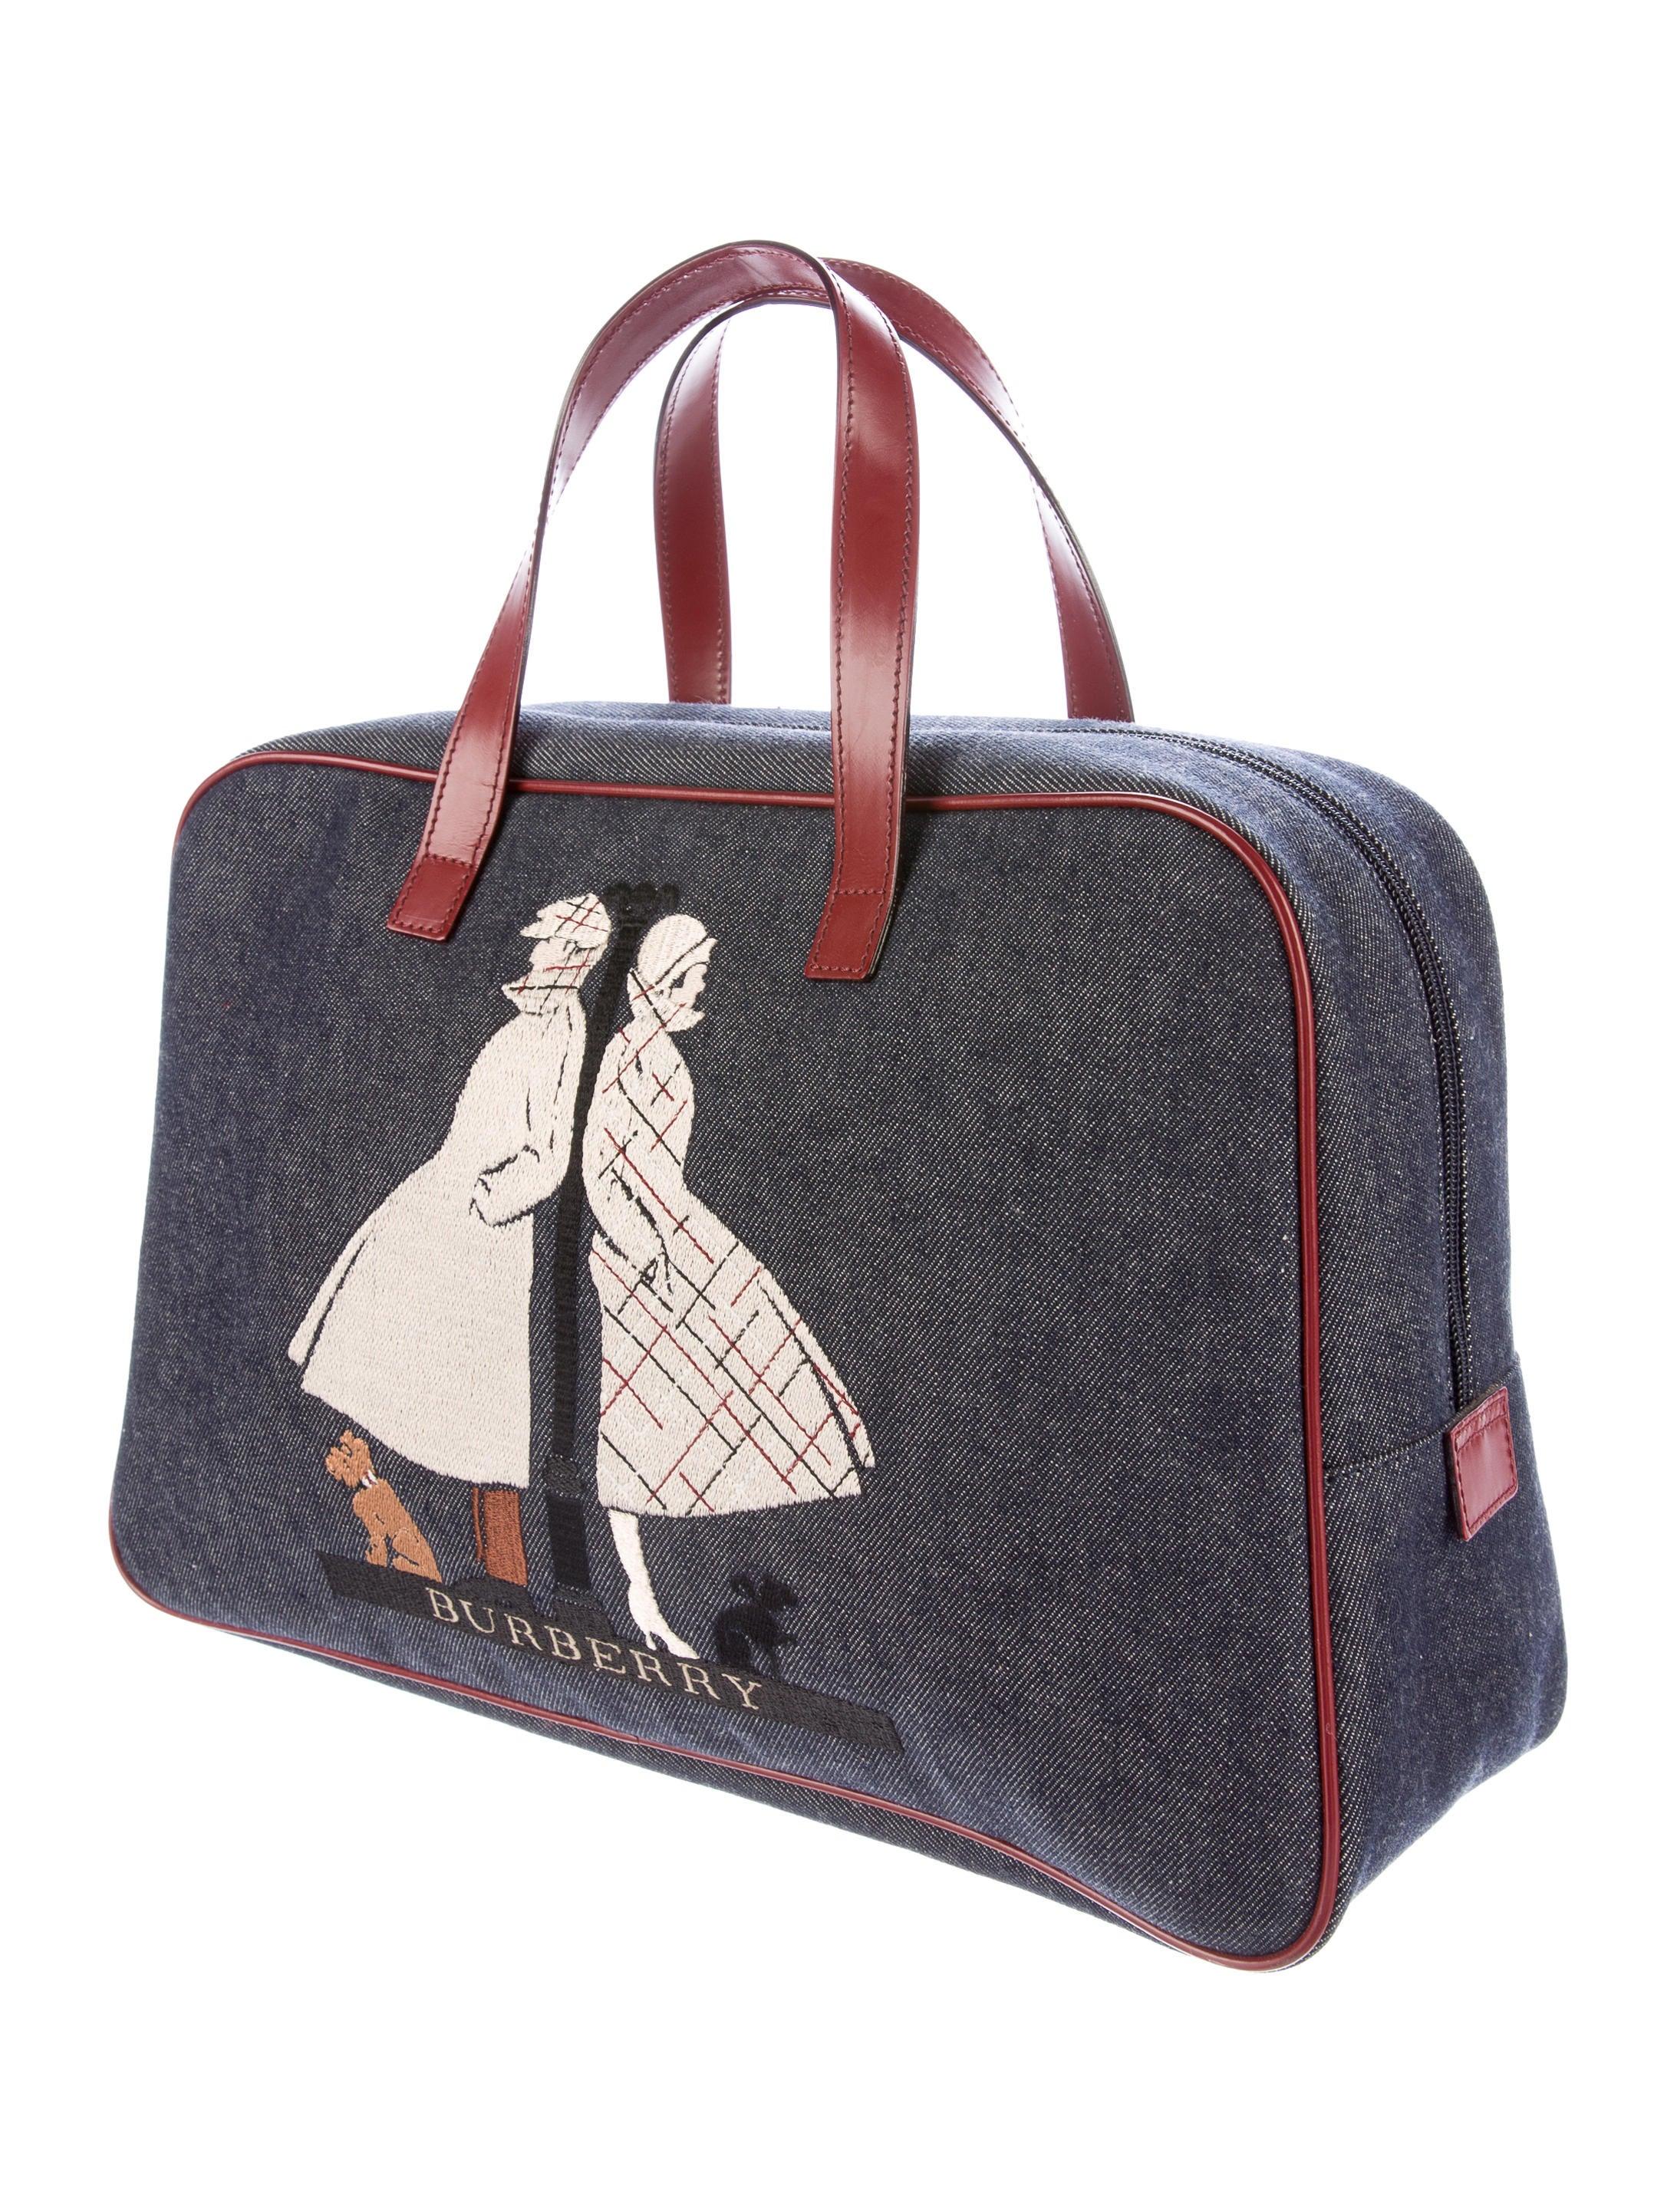 Burberry london embroidered denim handle bag handbags